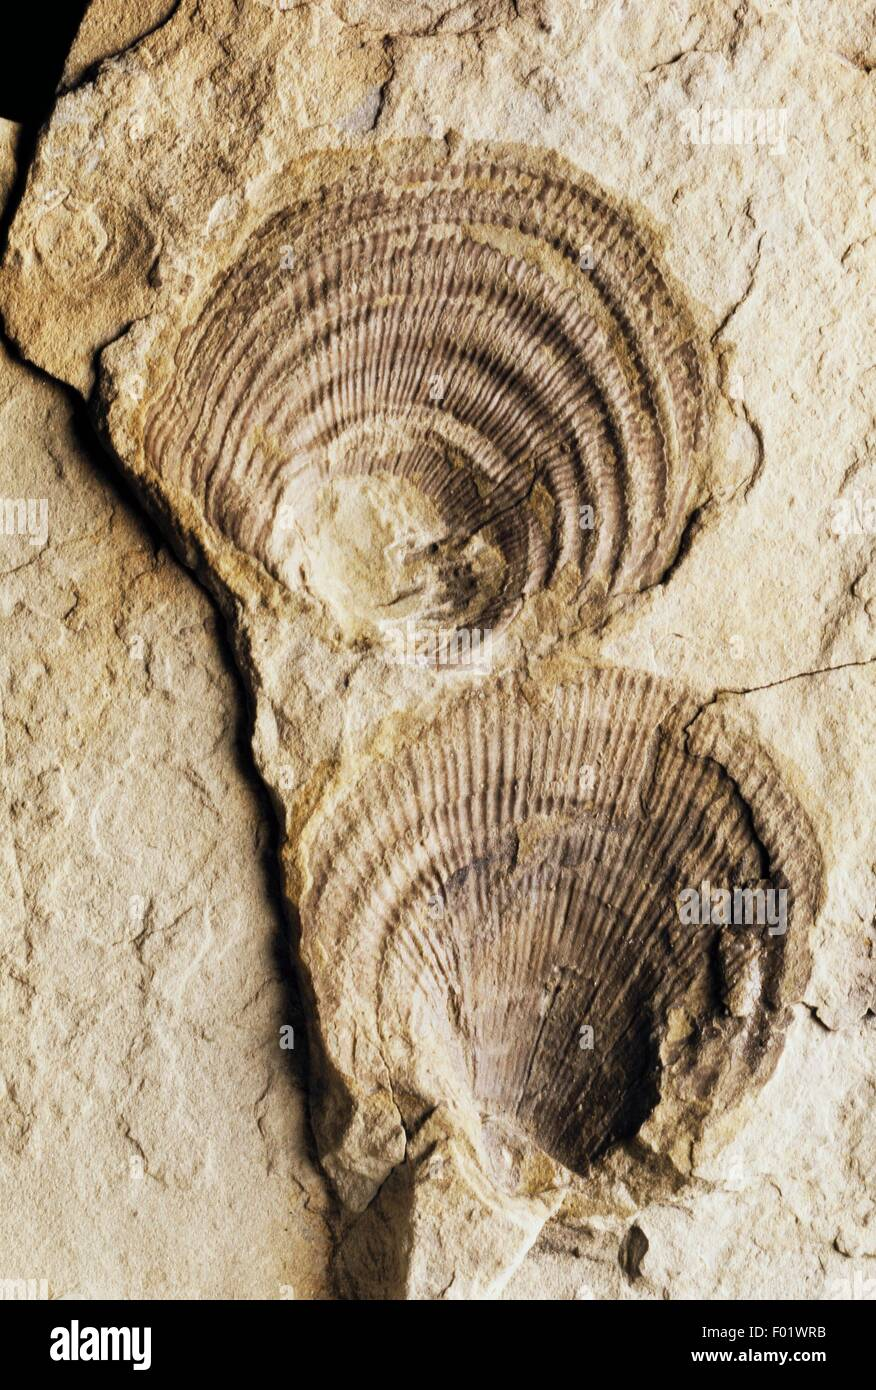 Claraia clarai fossiles, Bivalvia, Trias précoce. Banque D'Images